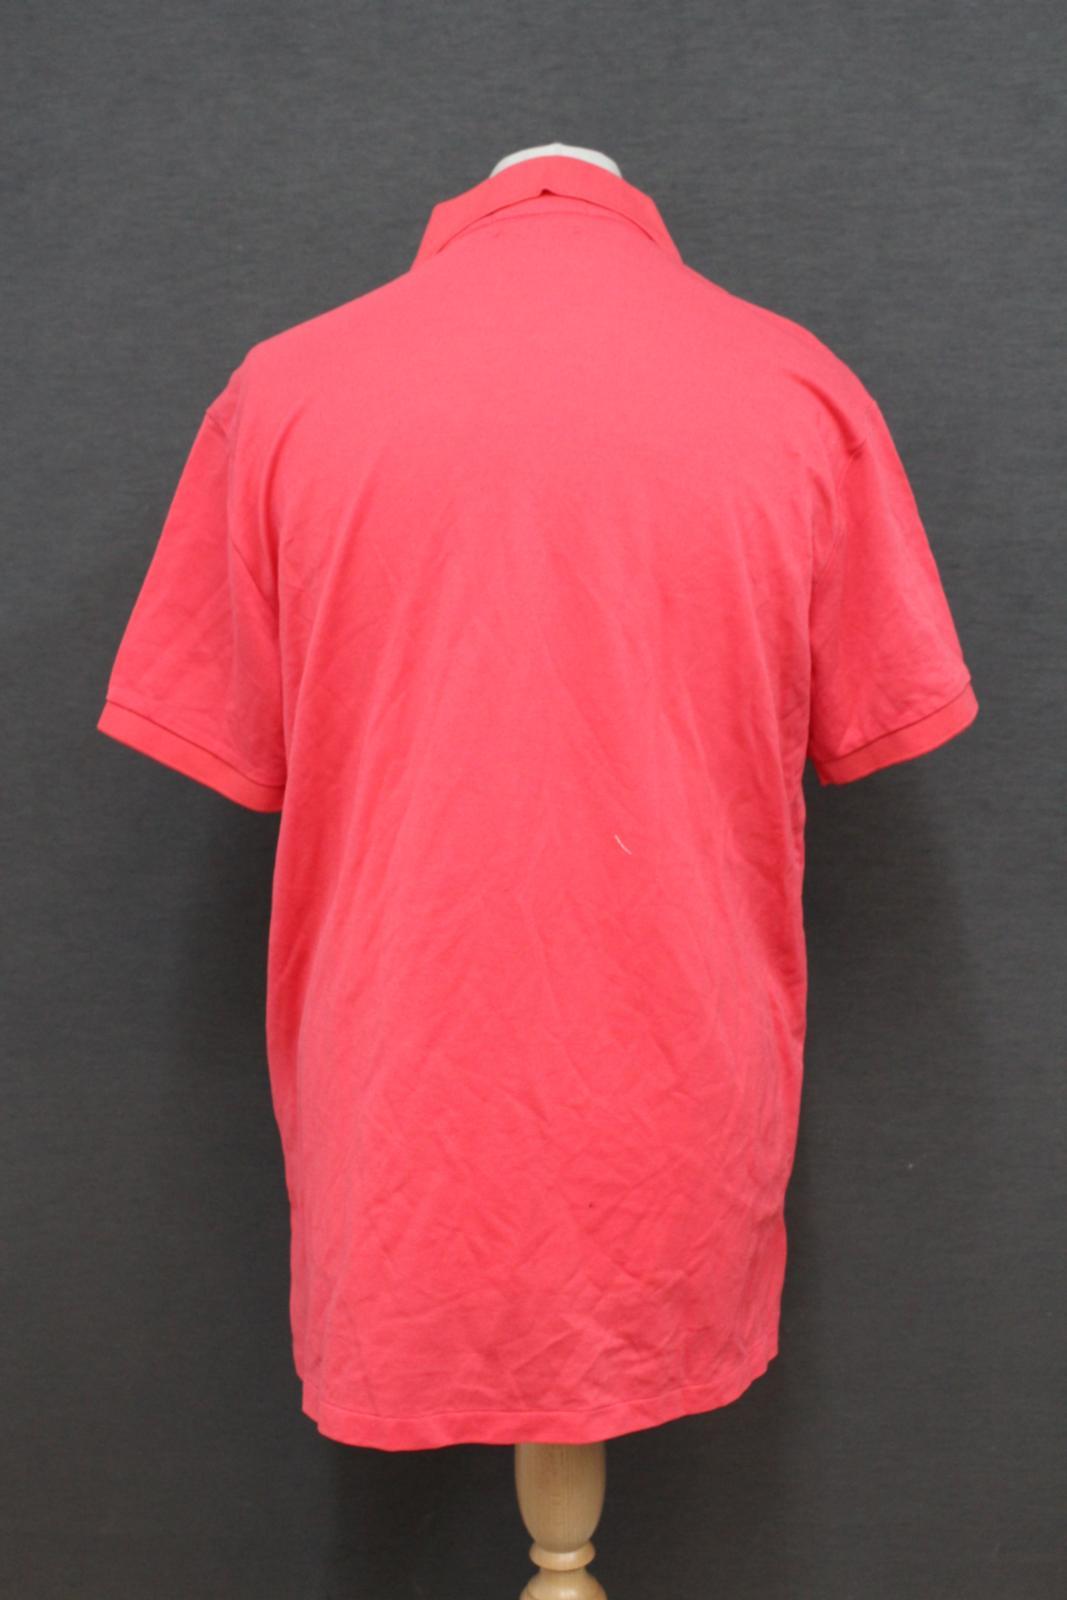 Ralph-Lauren-Polo-para-hombre-de-color-rosa-de-algodon-Manga-Corta-Camisa-Polo-De-Ajuste miniatura 4